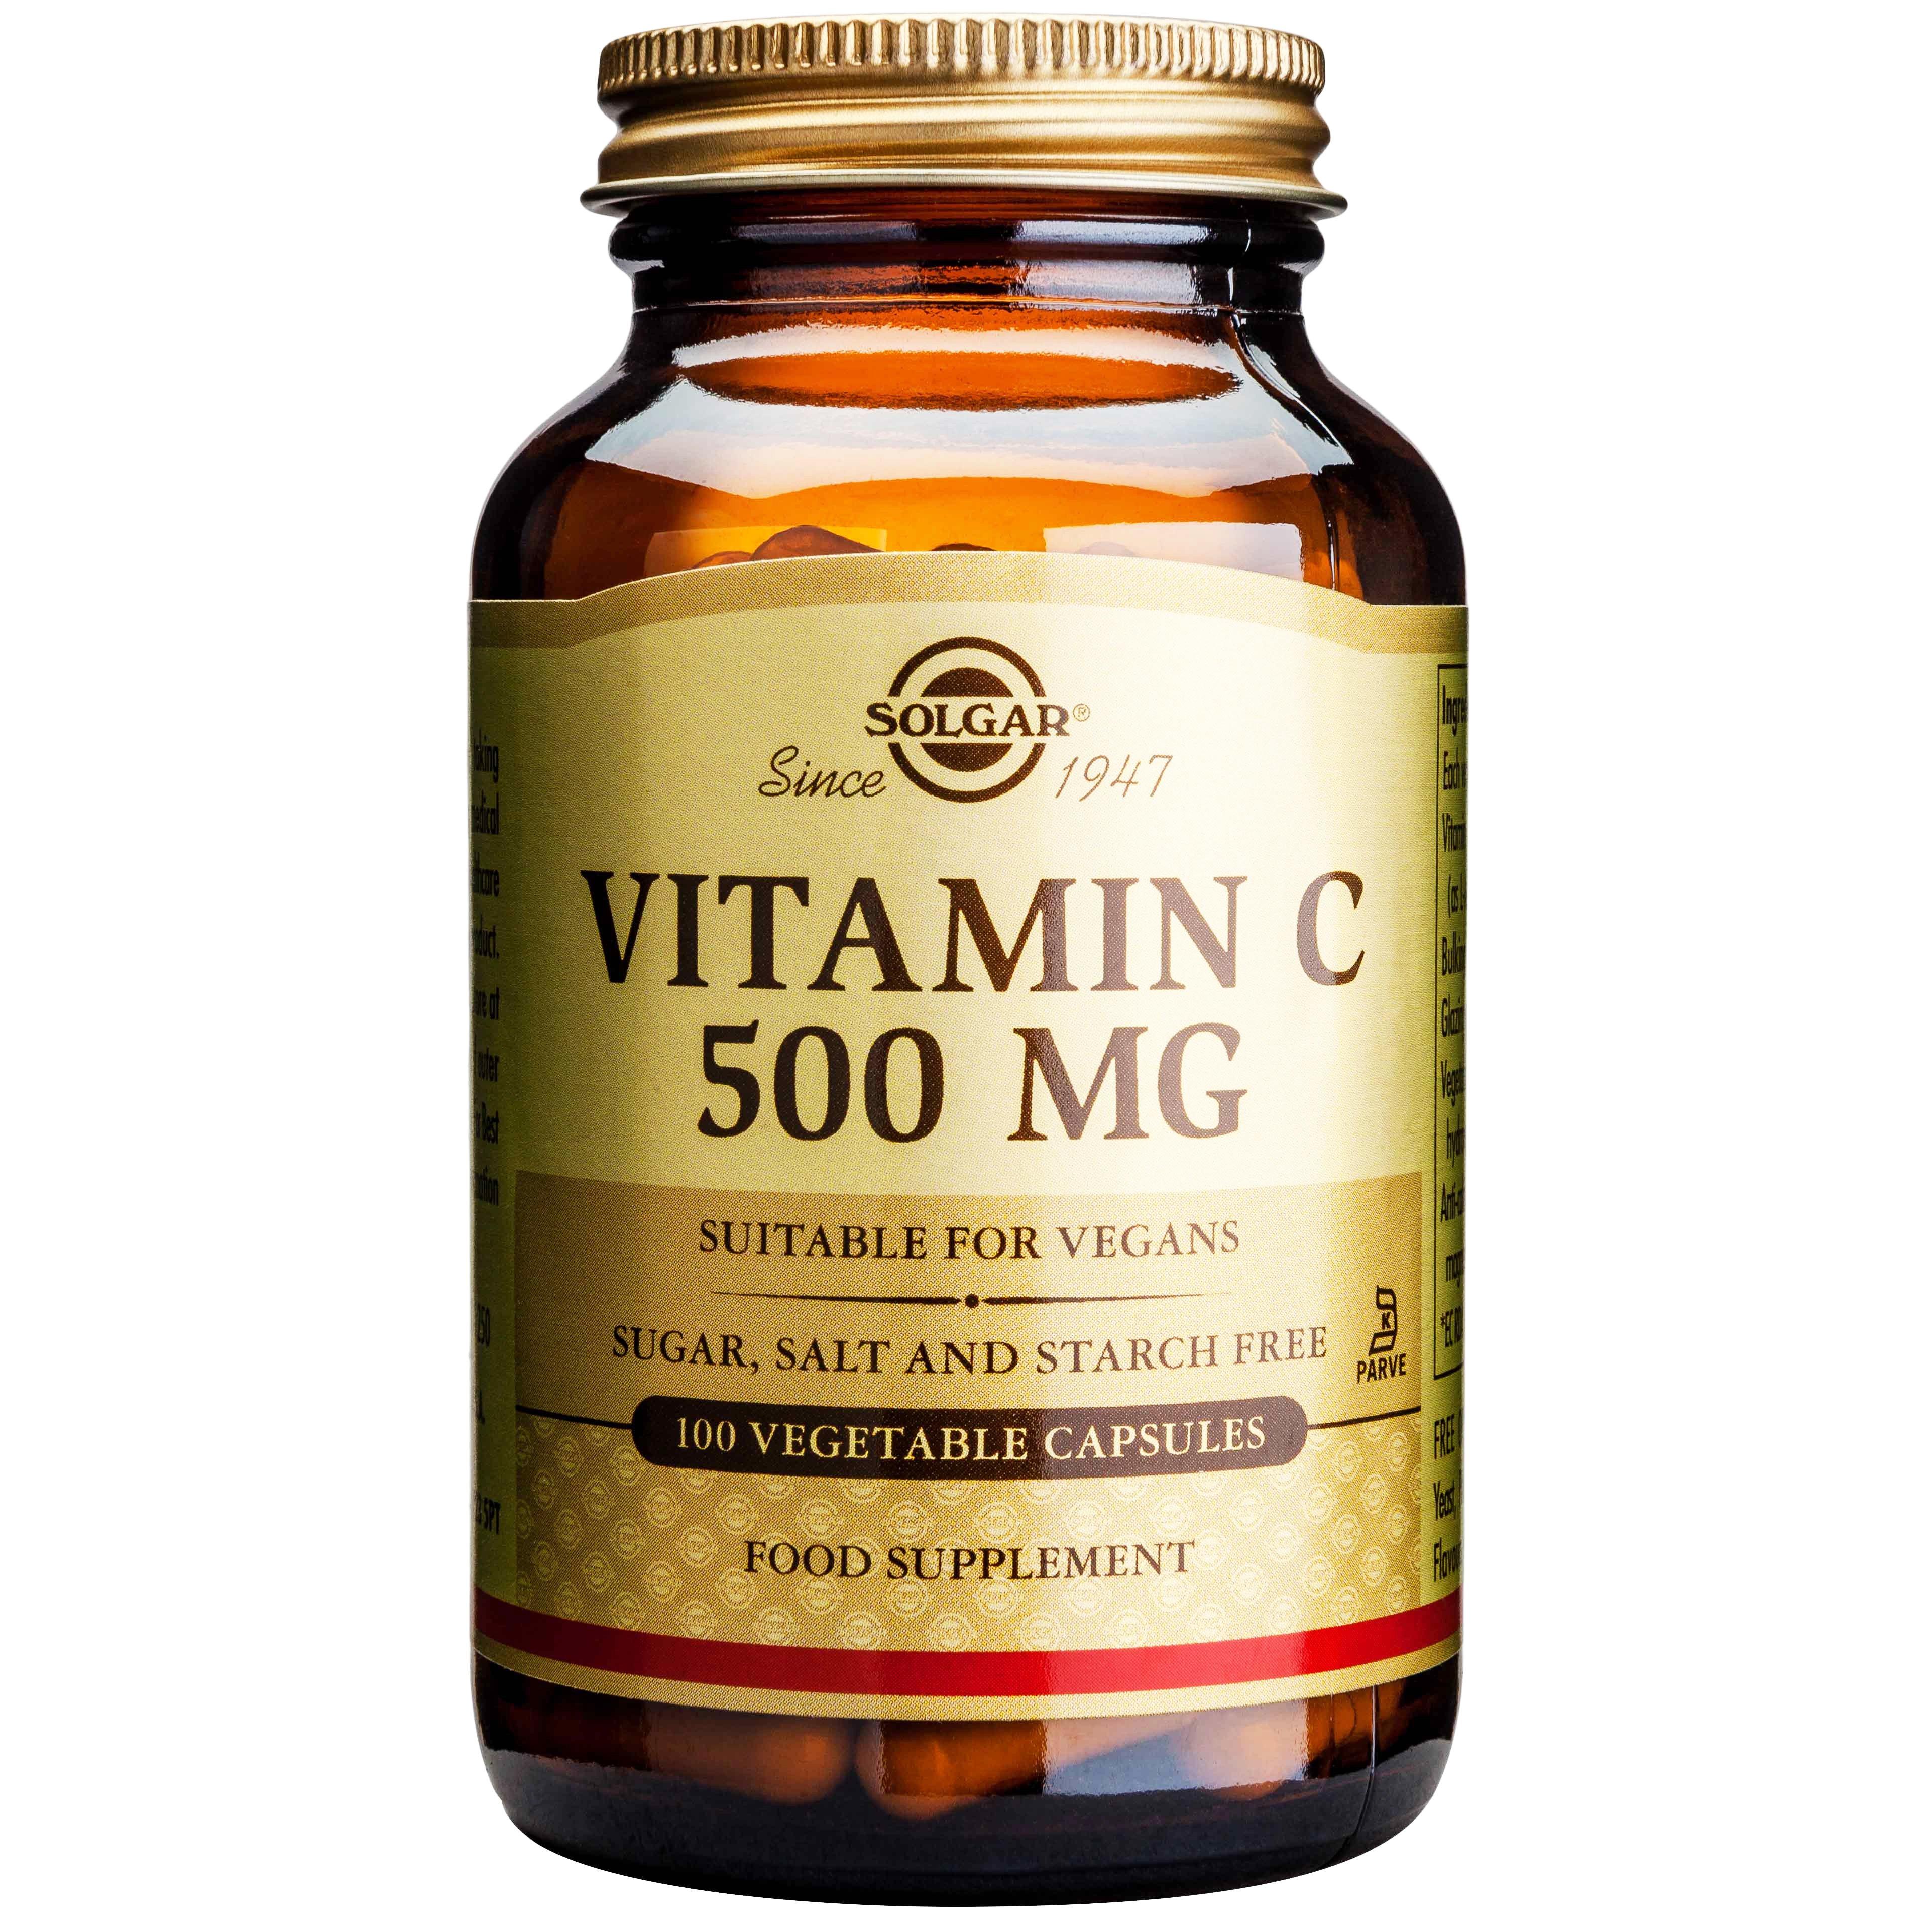 Solgar Vitamin C Αντιοξειδωτική Βιταμίνη Απαραίτητη για την Υγεία του Οργανισμού veg.caps – 500mg/100 caps